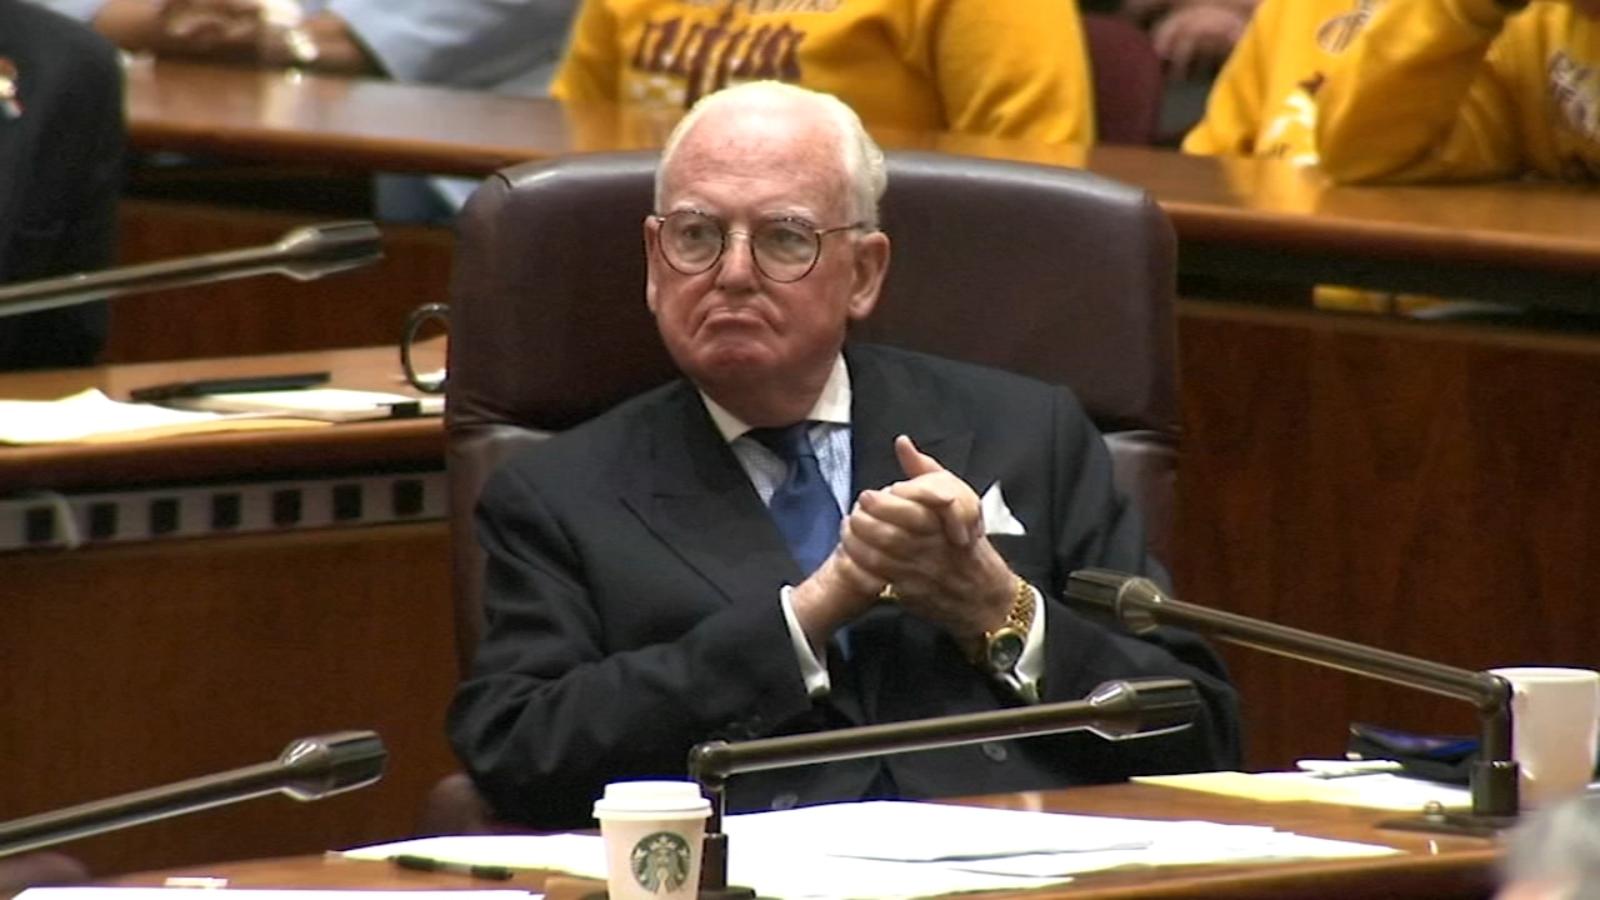 Weekend Watch: Alderman Ed Burke Investigation